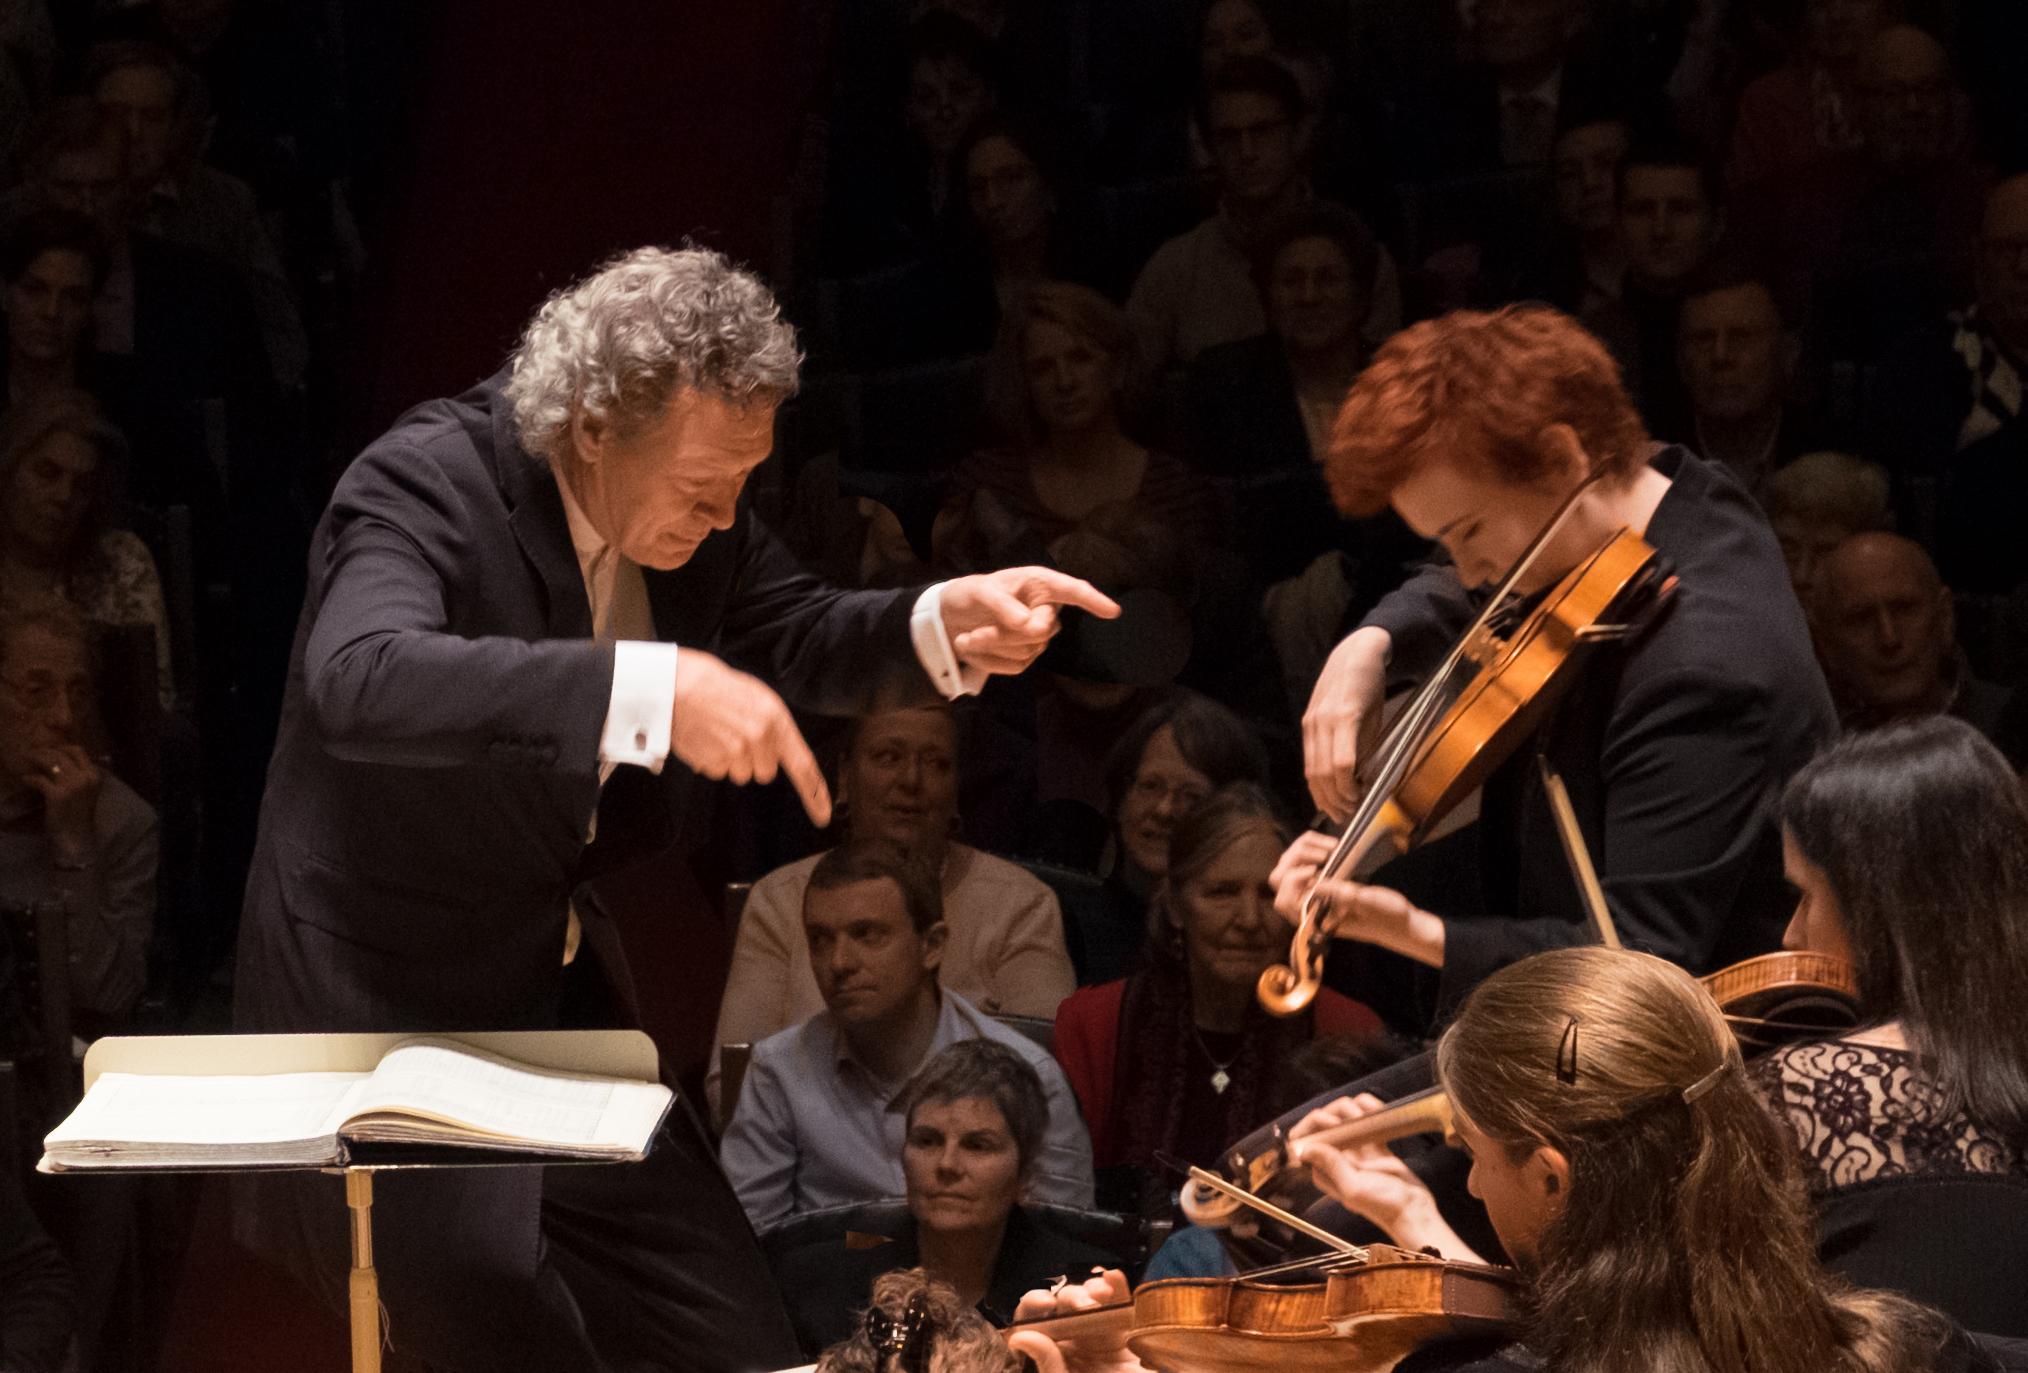 Artistic Director Harry Christophers and Concertmaster Aisslinn Nosky